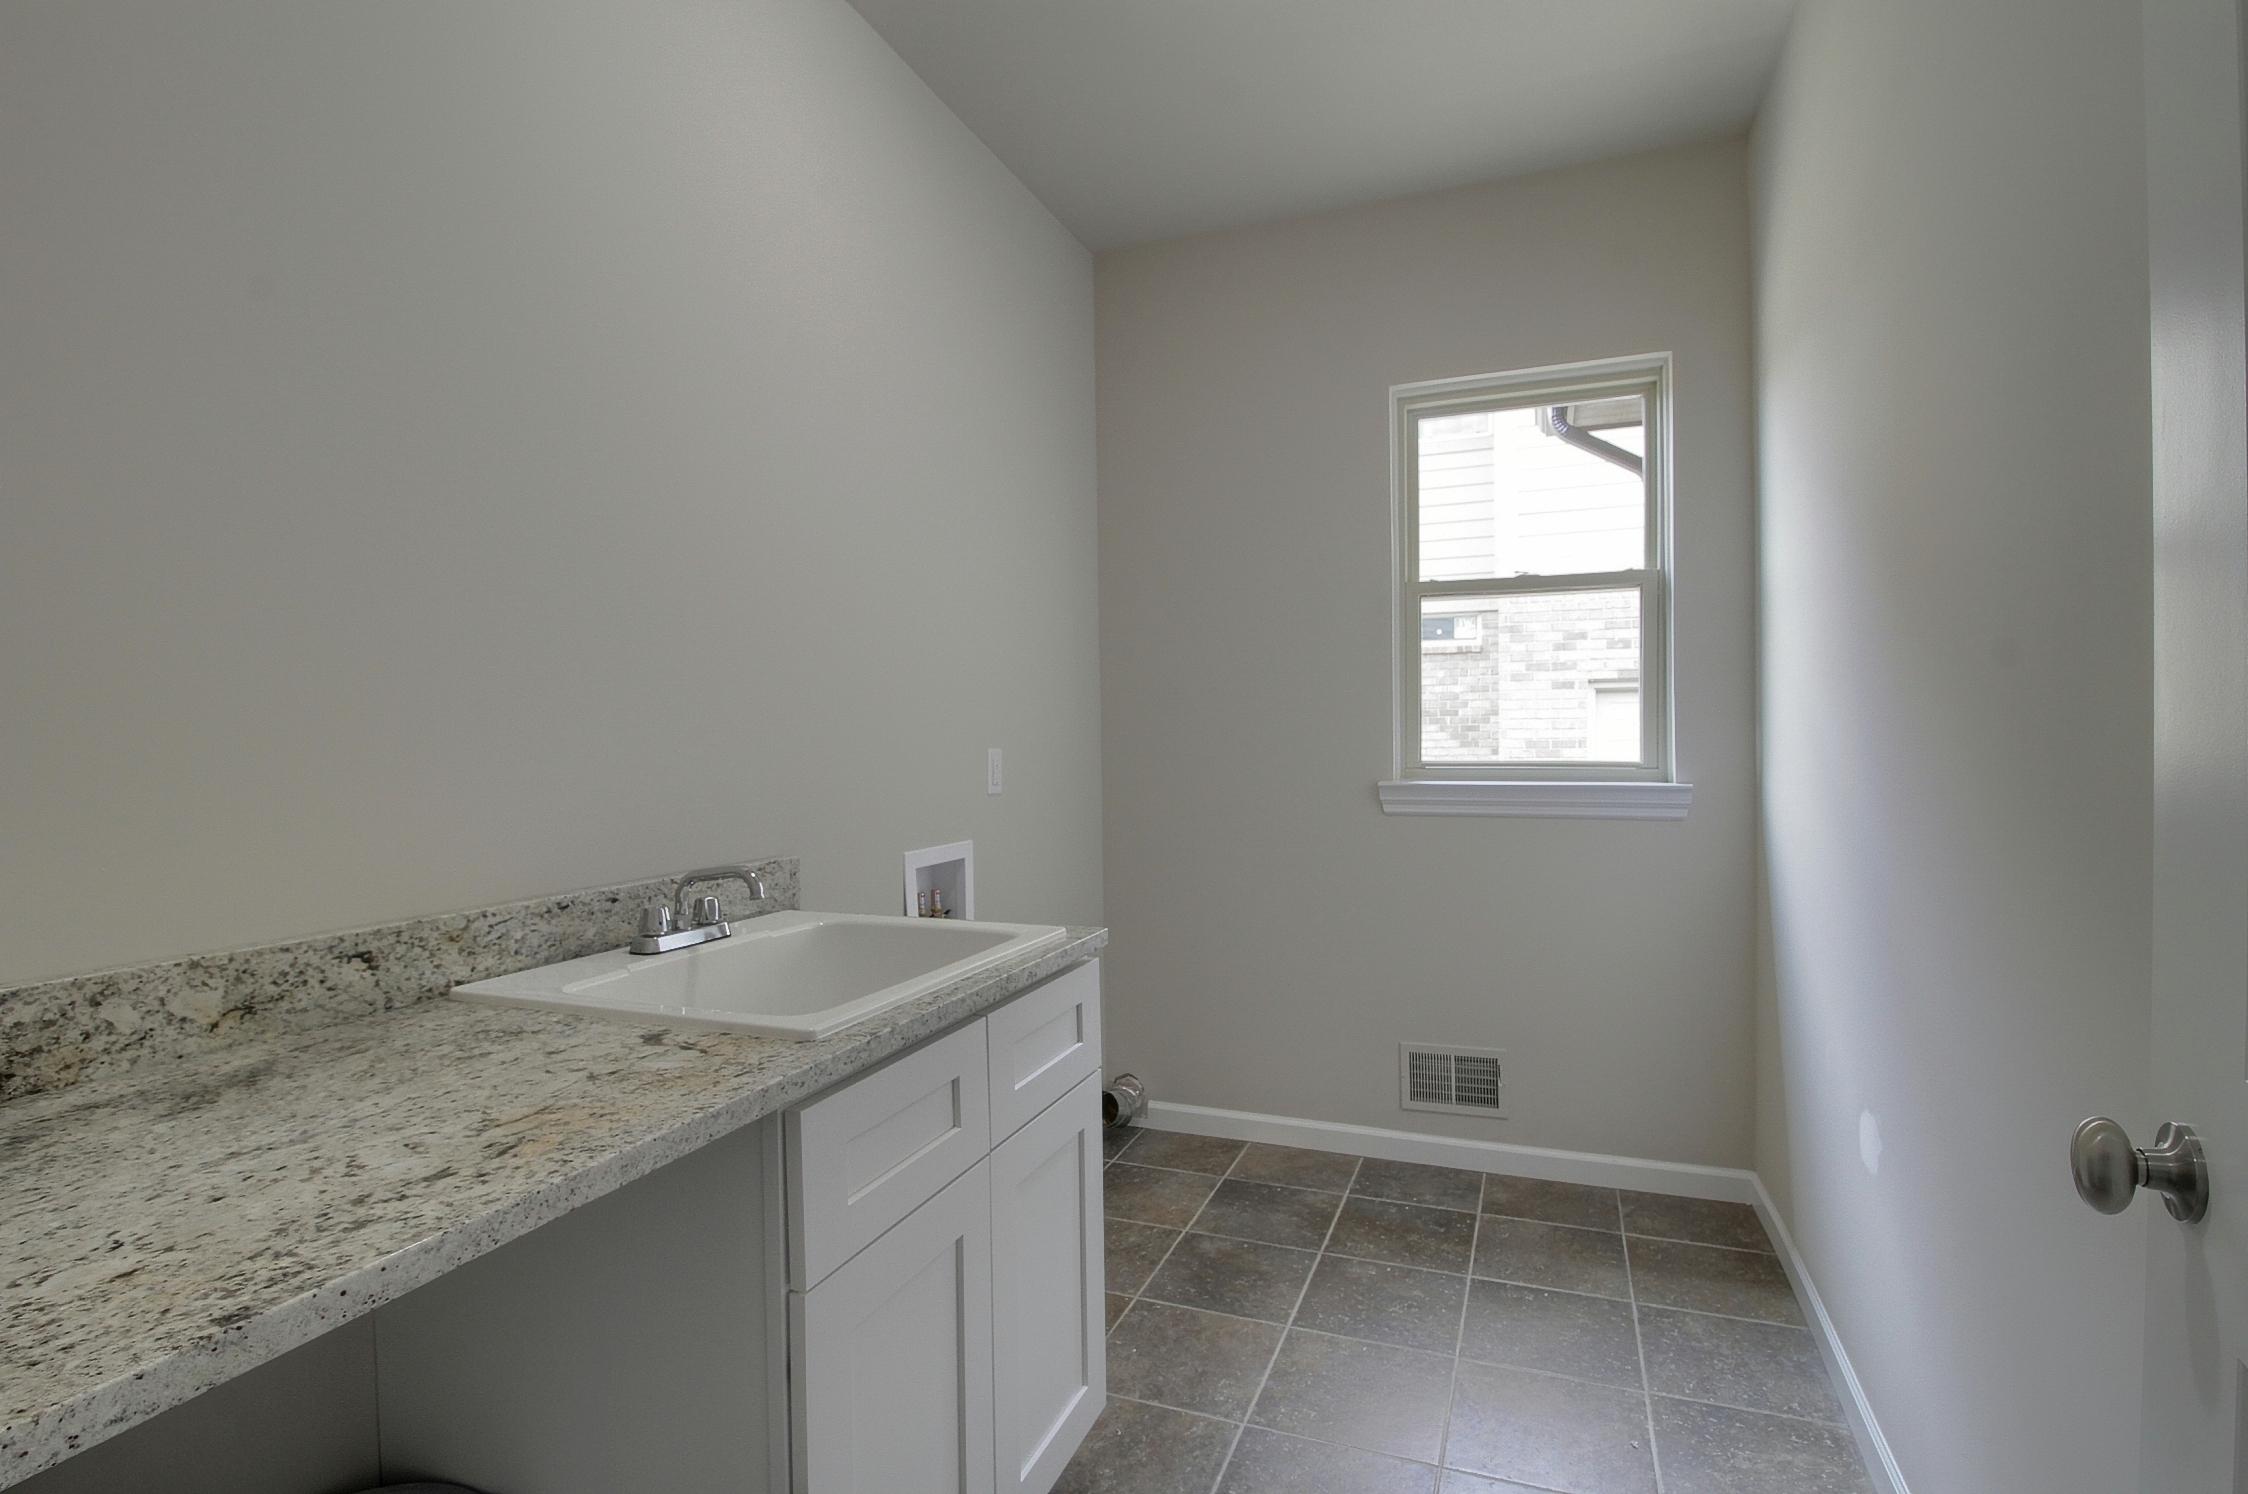 14-Laundry Room.jpg